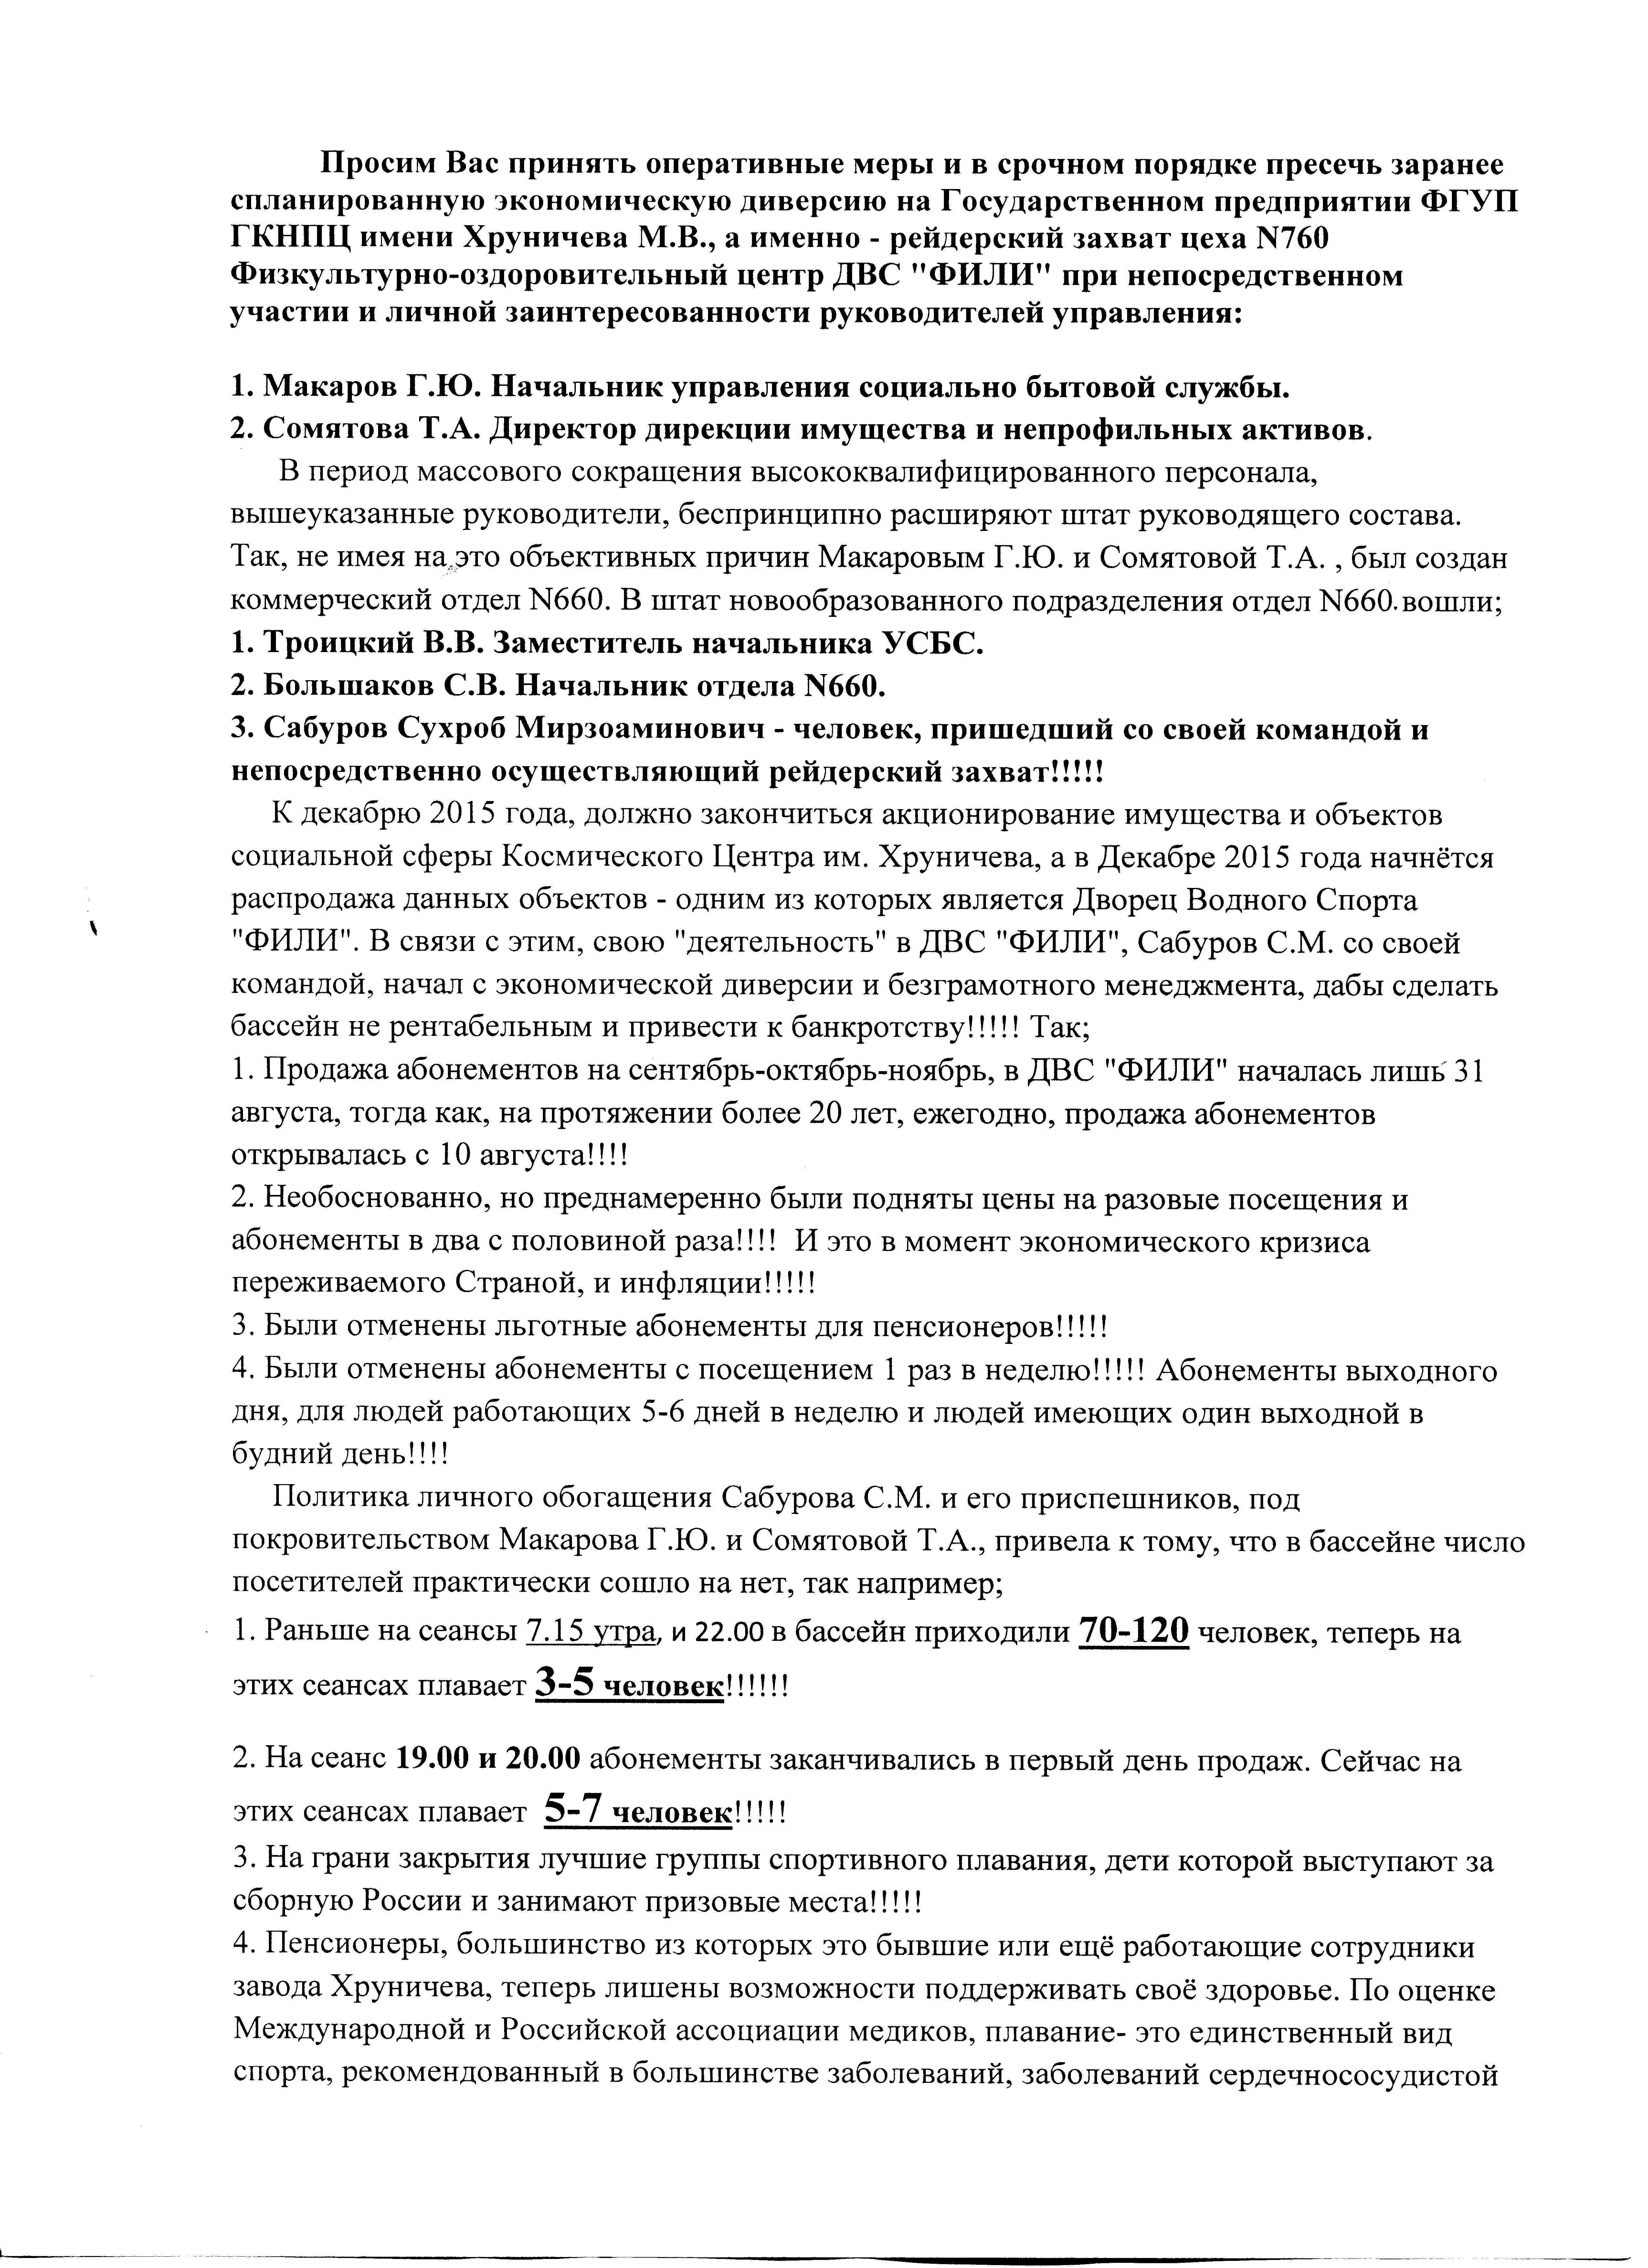 http://ic.pics.livejournal.com/t_kasatkina/51460547/18877/18877_original.jpg